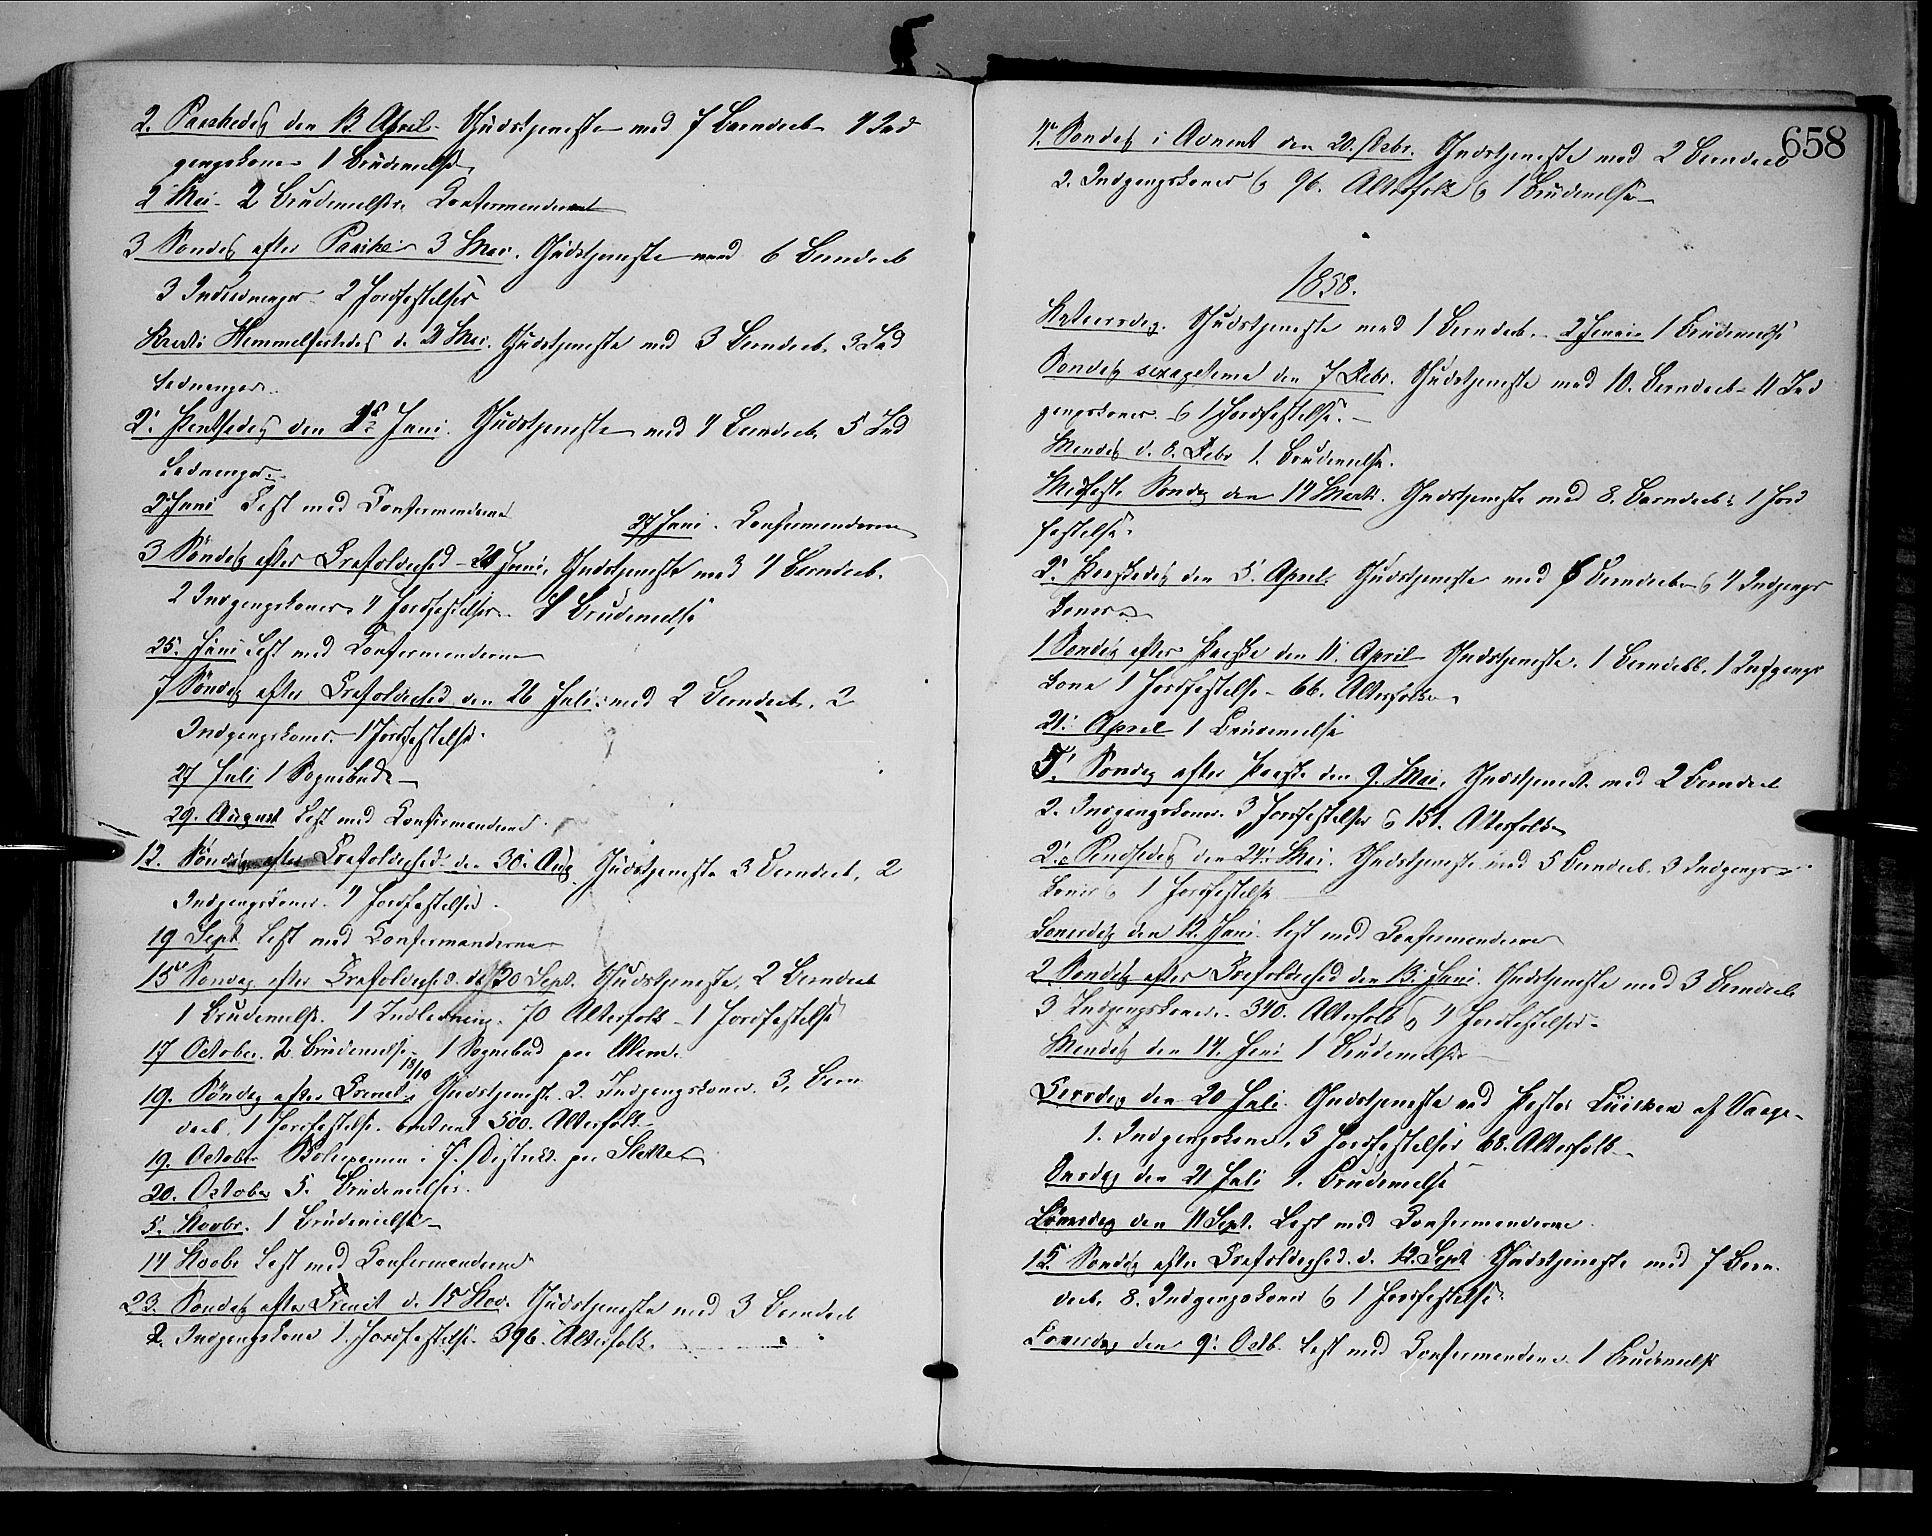 SAH, Dovre prestekontor, Ministerialbok nr. 1, 1854-1878, s. 658